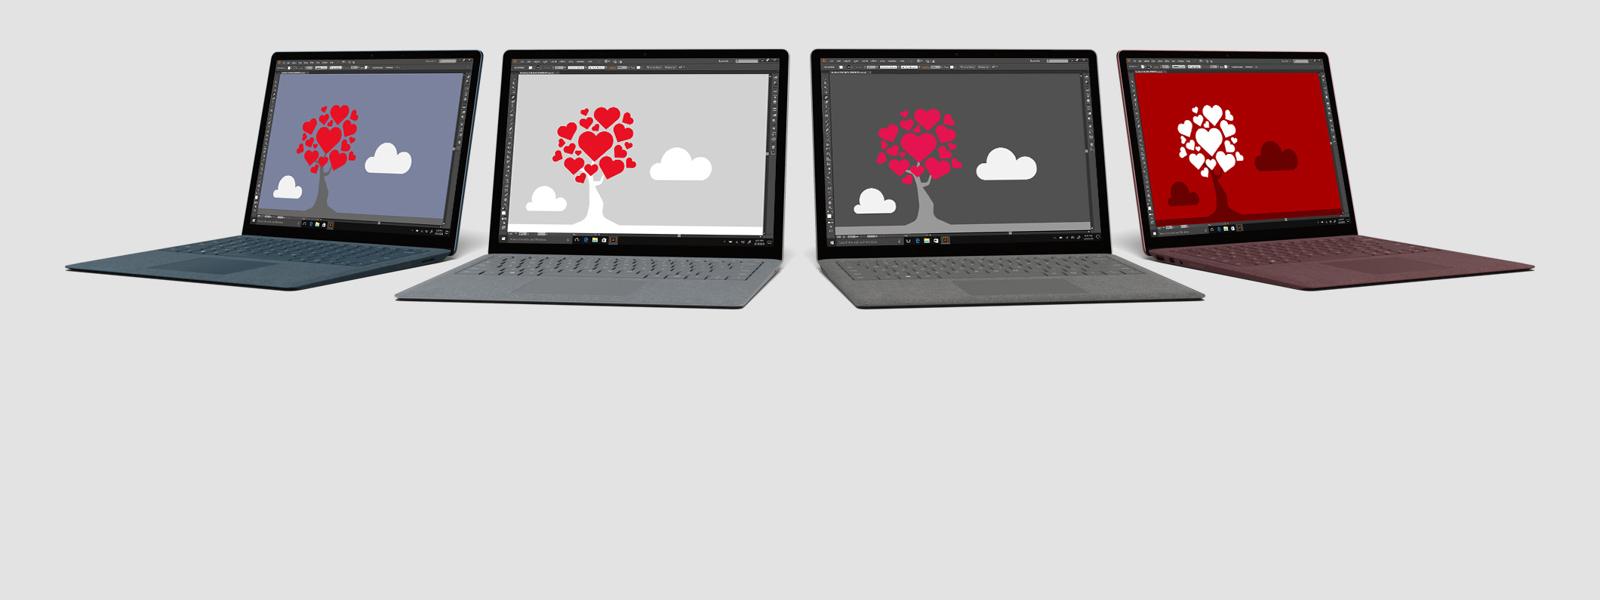 surface pro surface laptop surface book und vieles mehr microsoft store schweiz. Black Bedroom Furniture Sets. Home Design Ideas